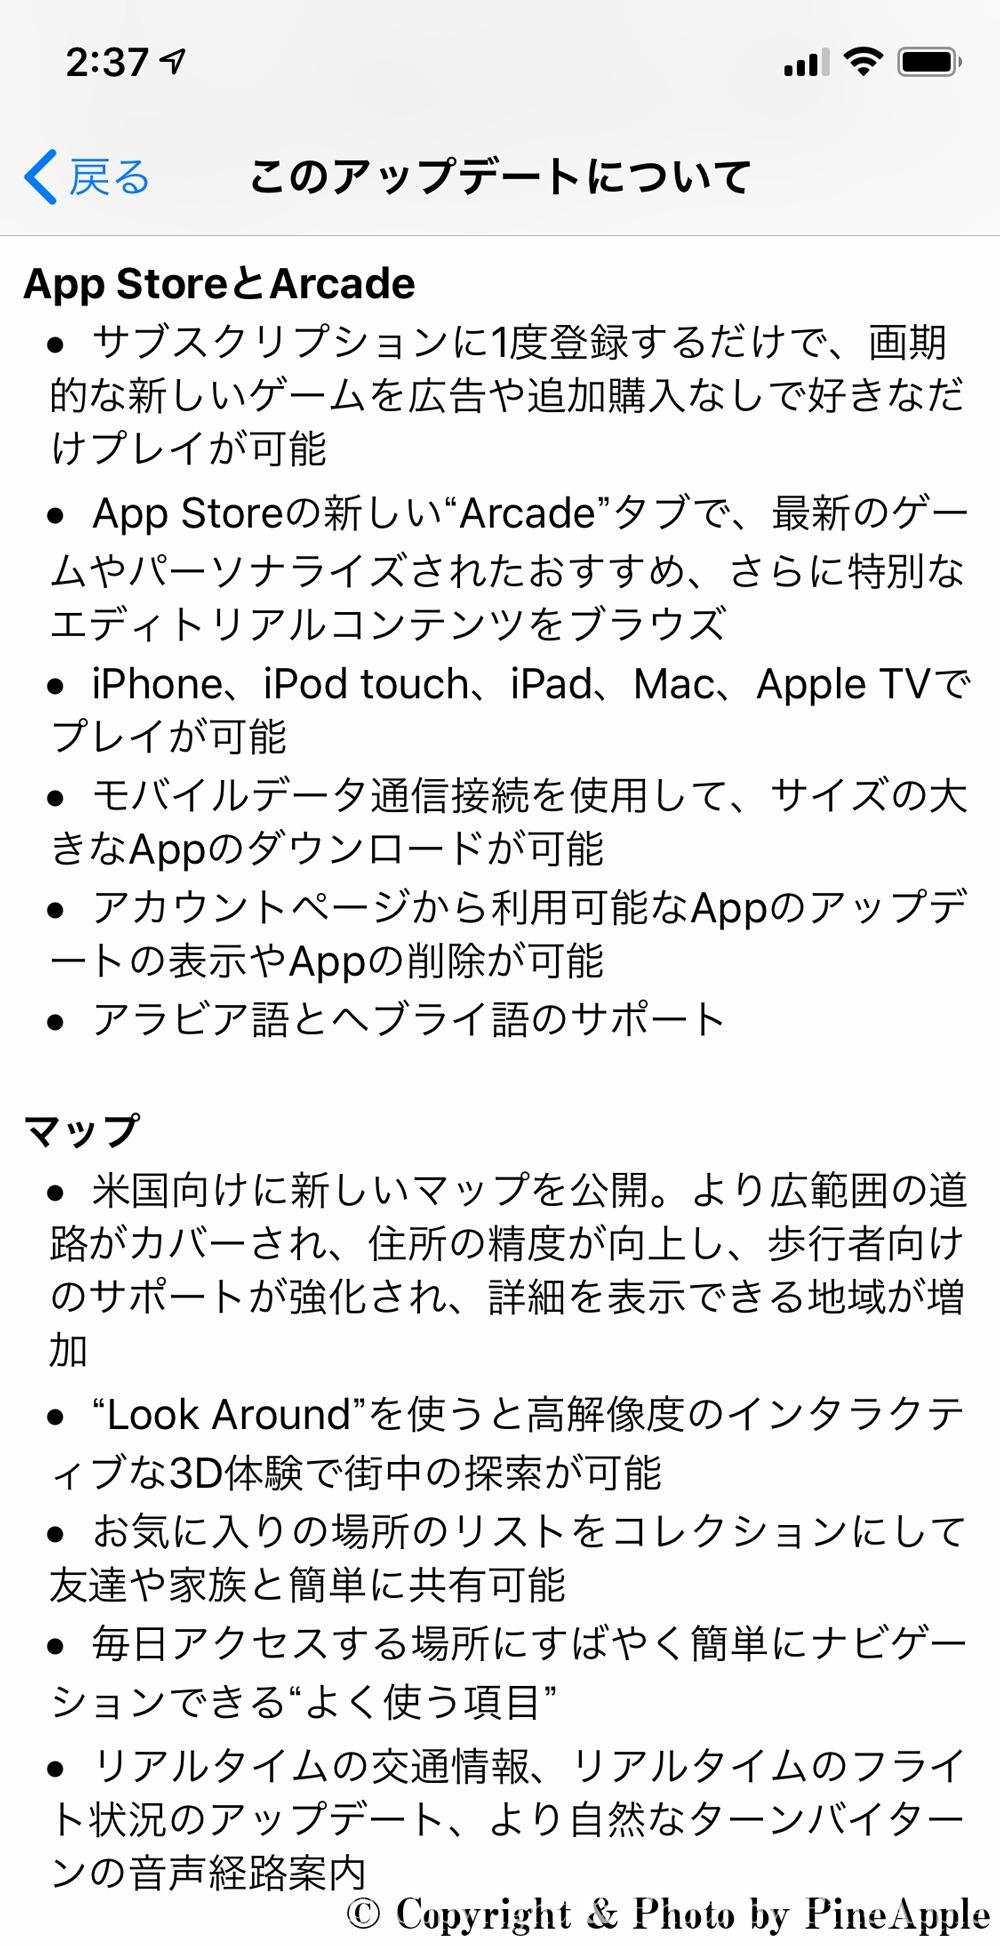 iOS 13:App Store と Arcade、マップ